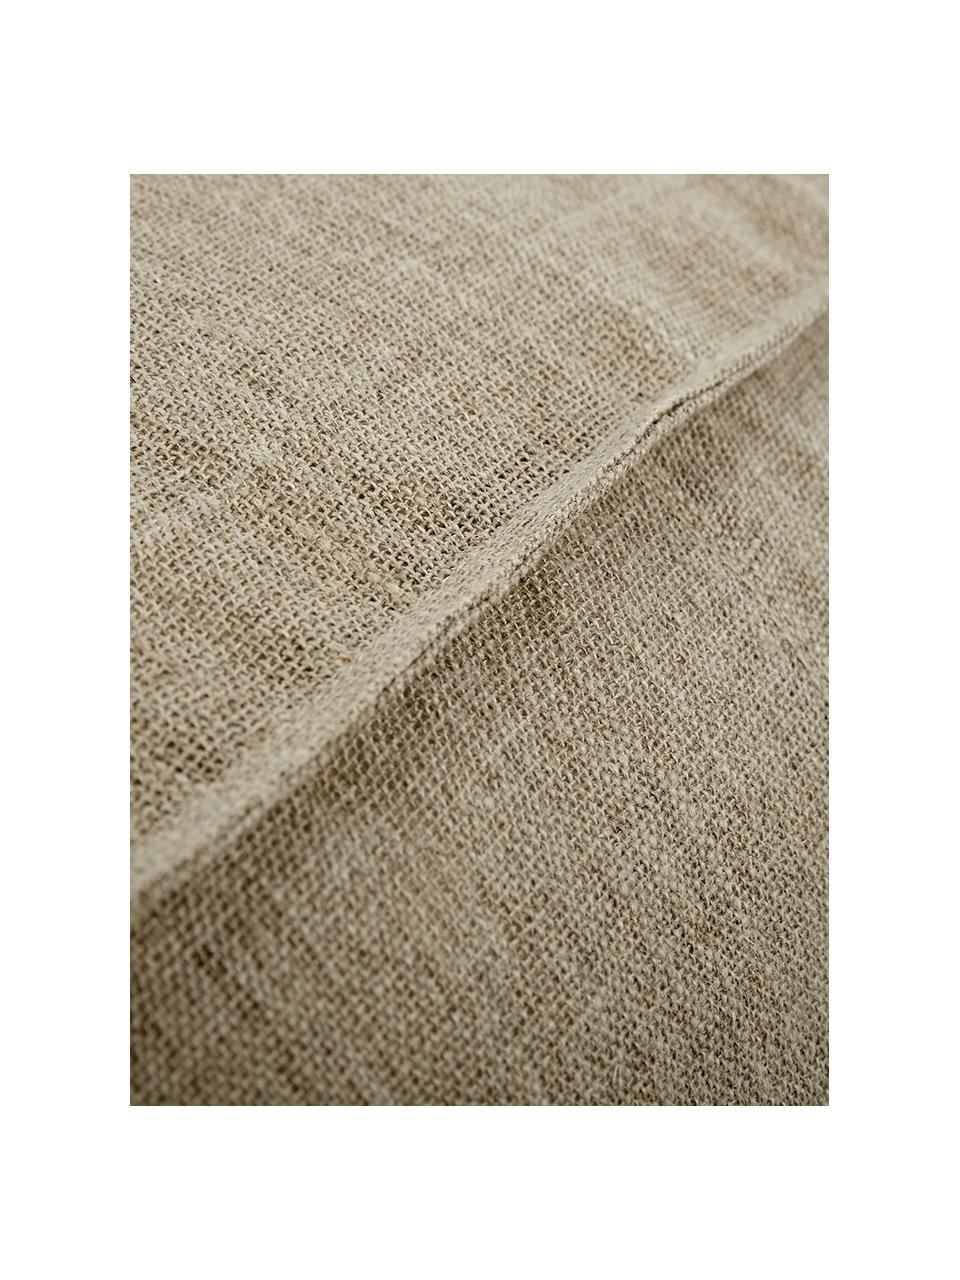 Handgemaakt linnen vloerkussen Saffron, Bekleding: 100% linnen, Onderzijde: katoen, Taupe, 50 x 25 cm